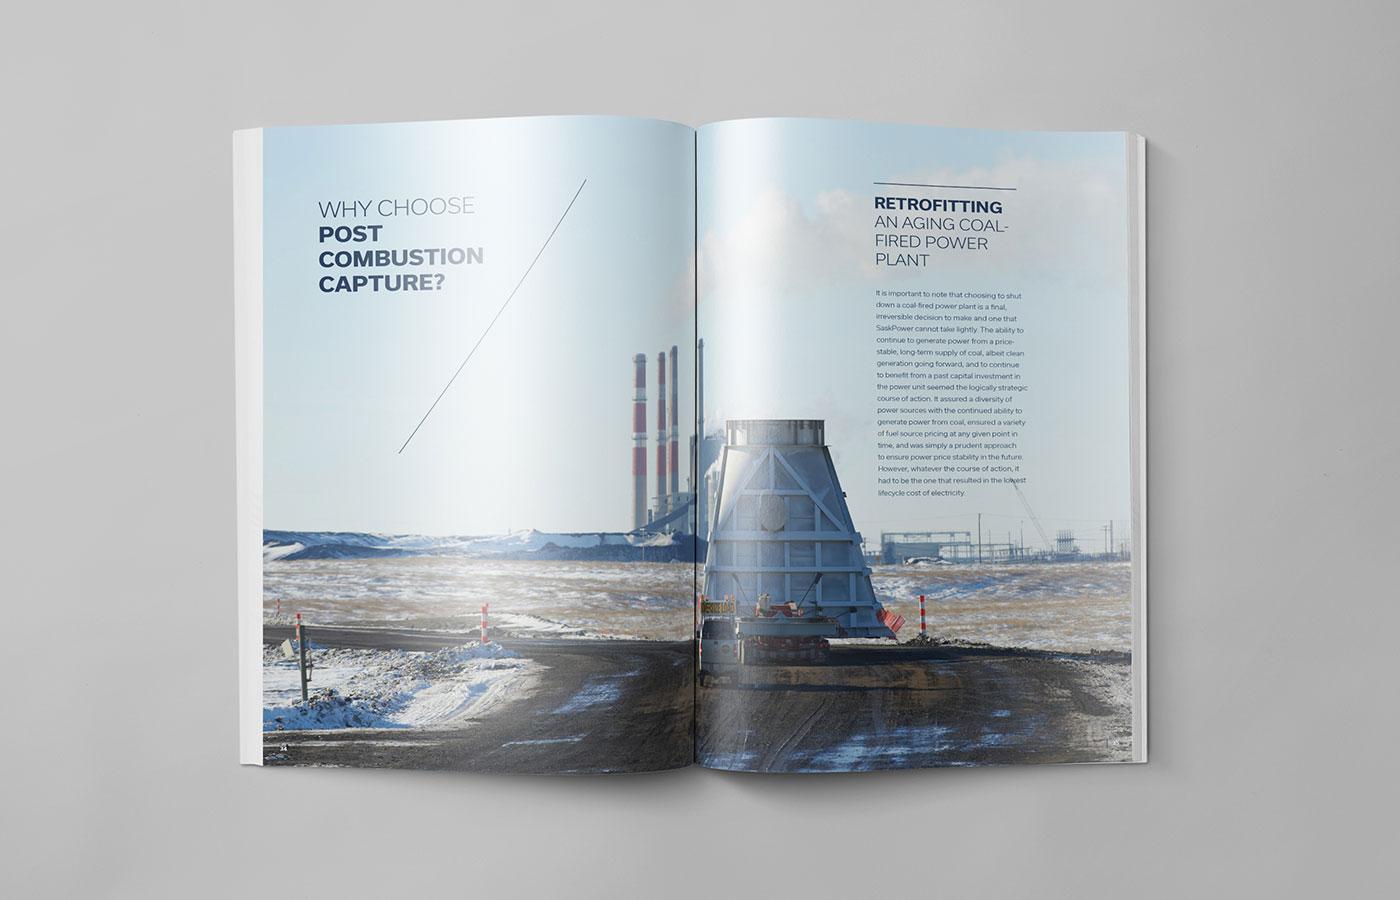 covetdesign_logo-design_branding_brochure-design_graphic-designer_vancouver_print_saskpower8